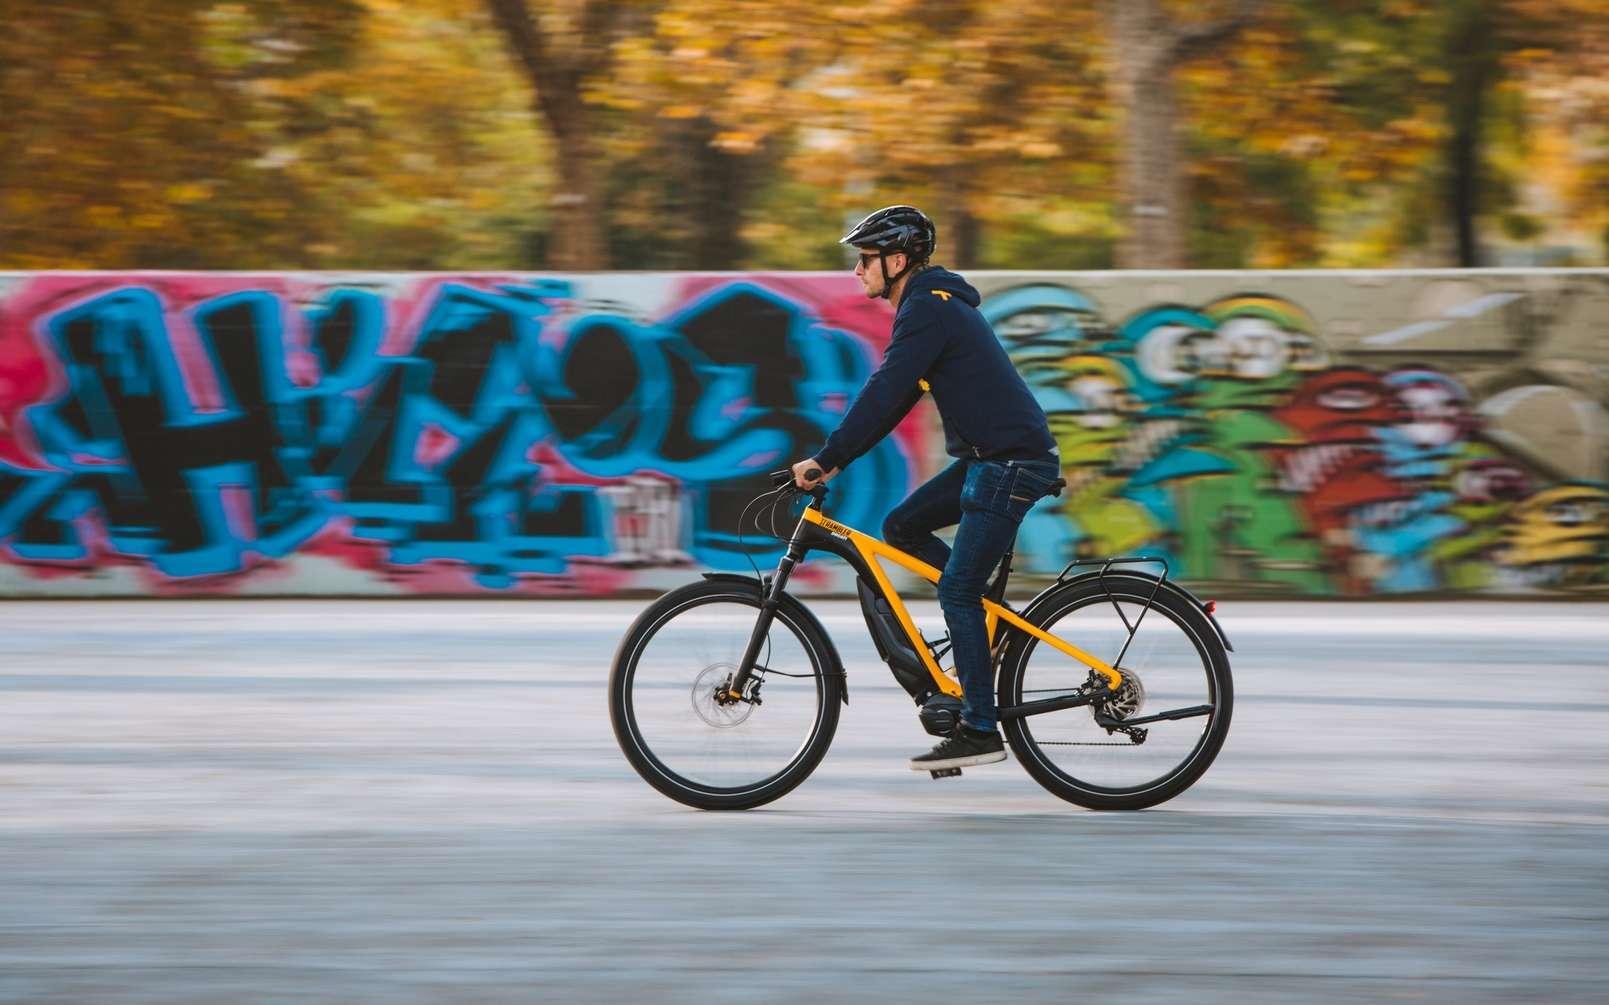 Le Ducati e-Scrambler. © Ducati